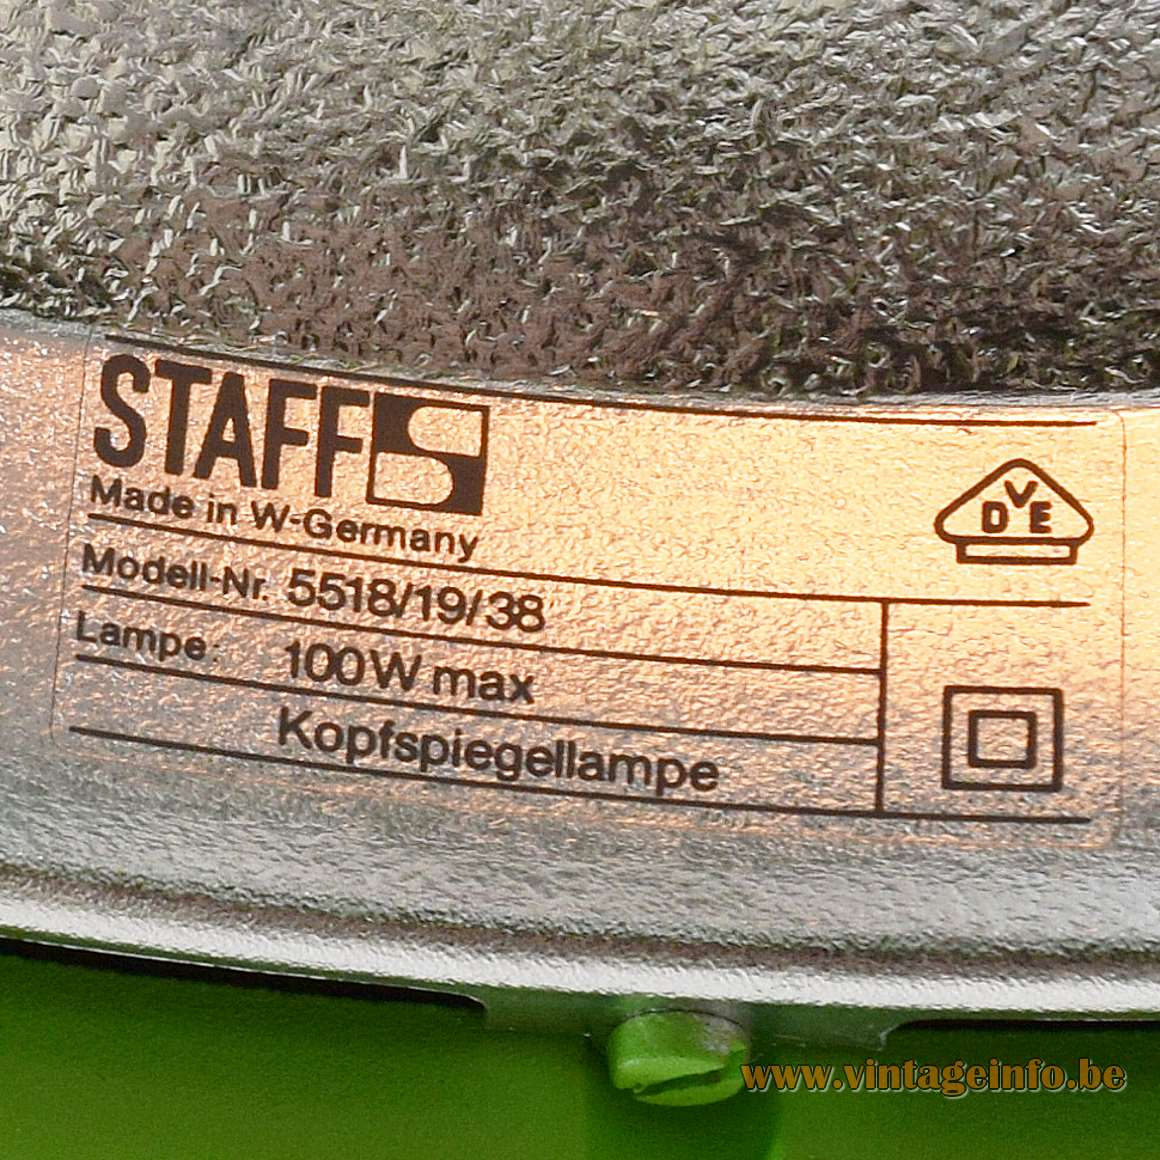 Staff 5518 Pendant Lamps - Modell-Nr. 5518/19/38 100 W max Kopfspiegellampe